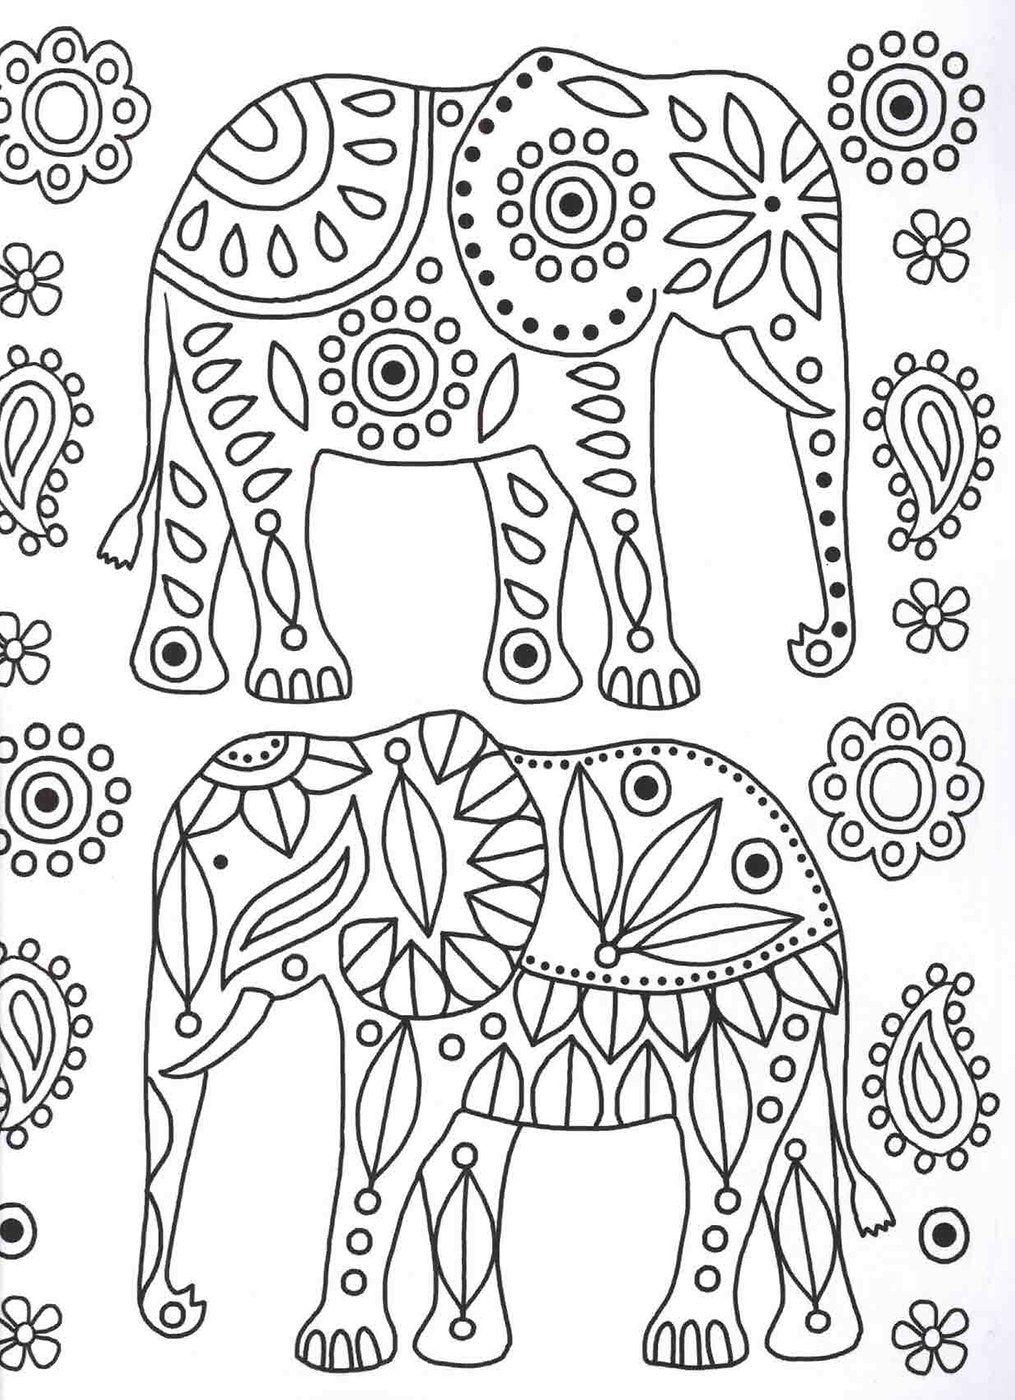 Elephants colouring page |Patterns Coloring Book | Terapia de color ...